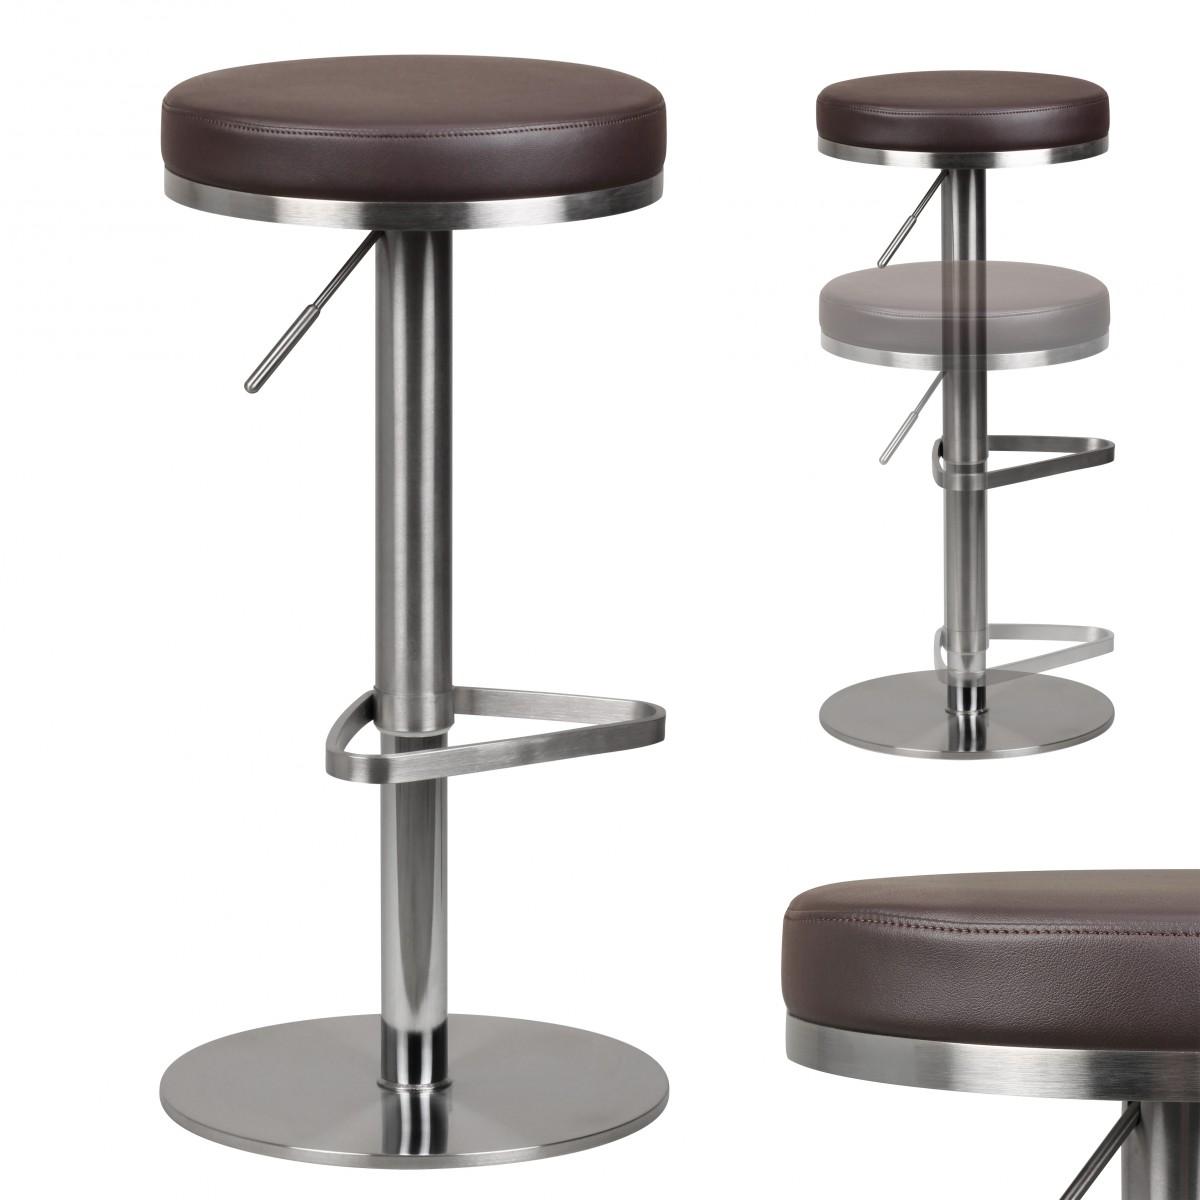 barhocker wohnling durable m7 edelstahl geb rstet braun 38833. Black Bedroom Furniture Sets. Home Design Ideas